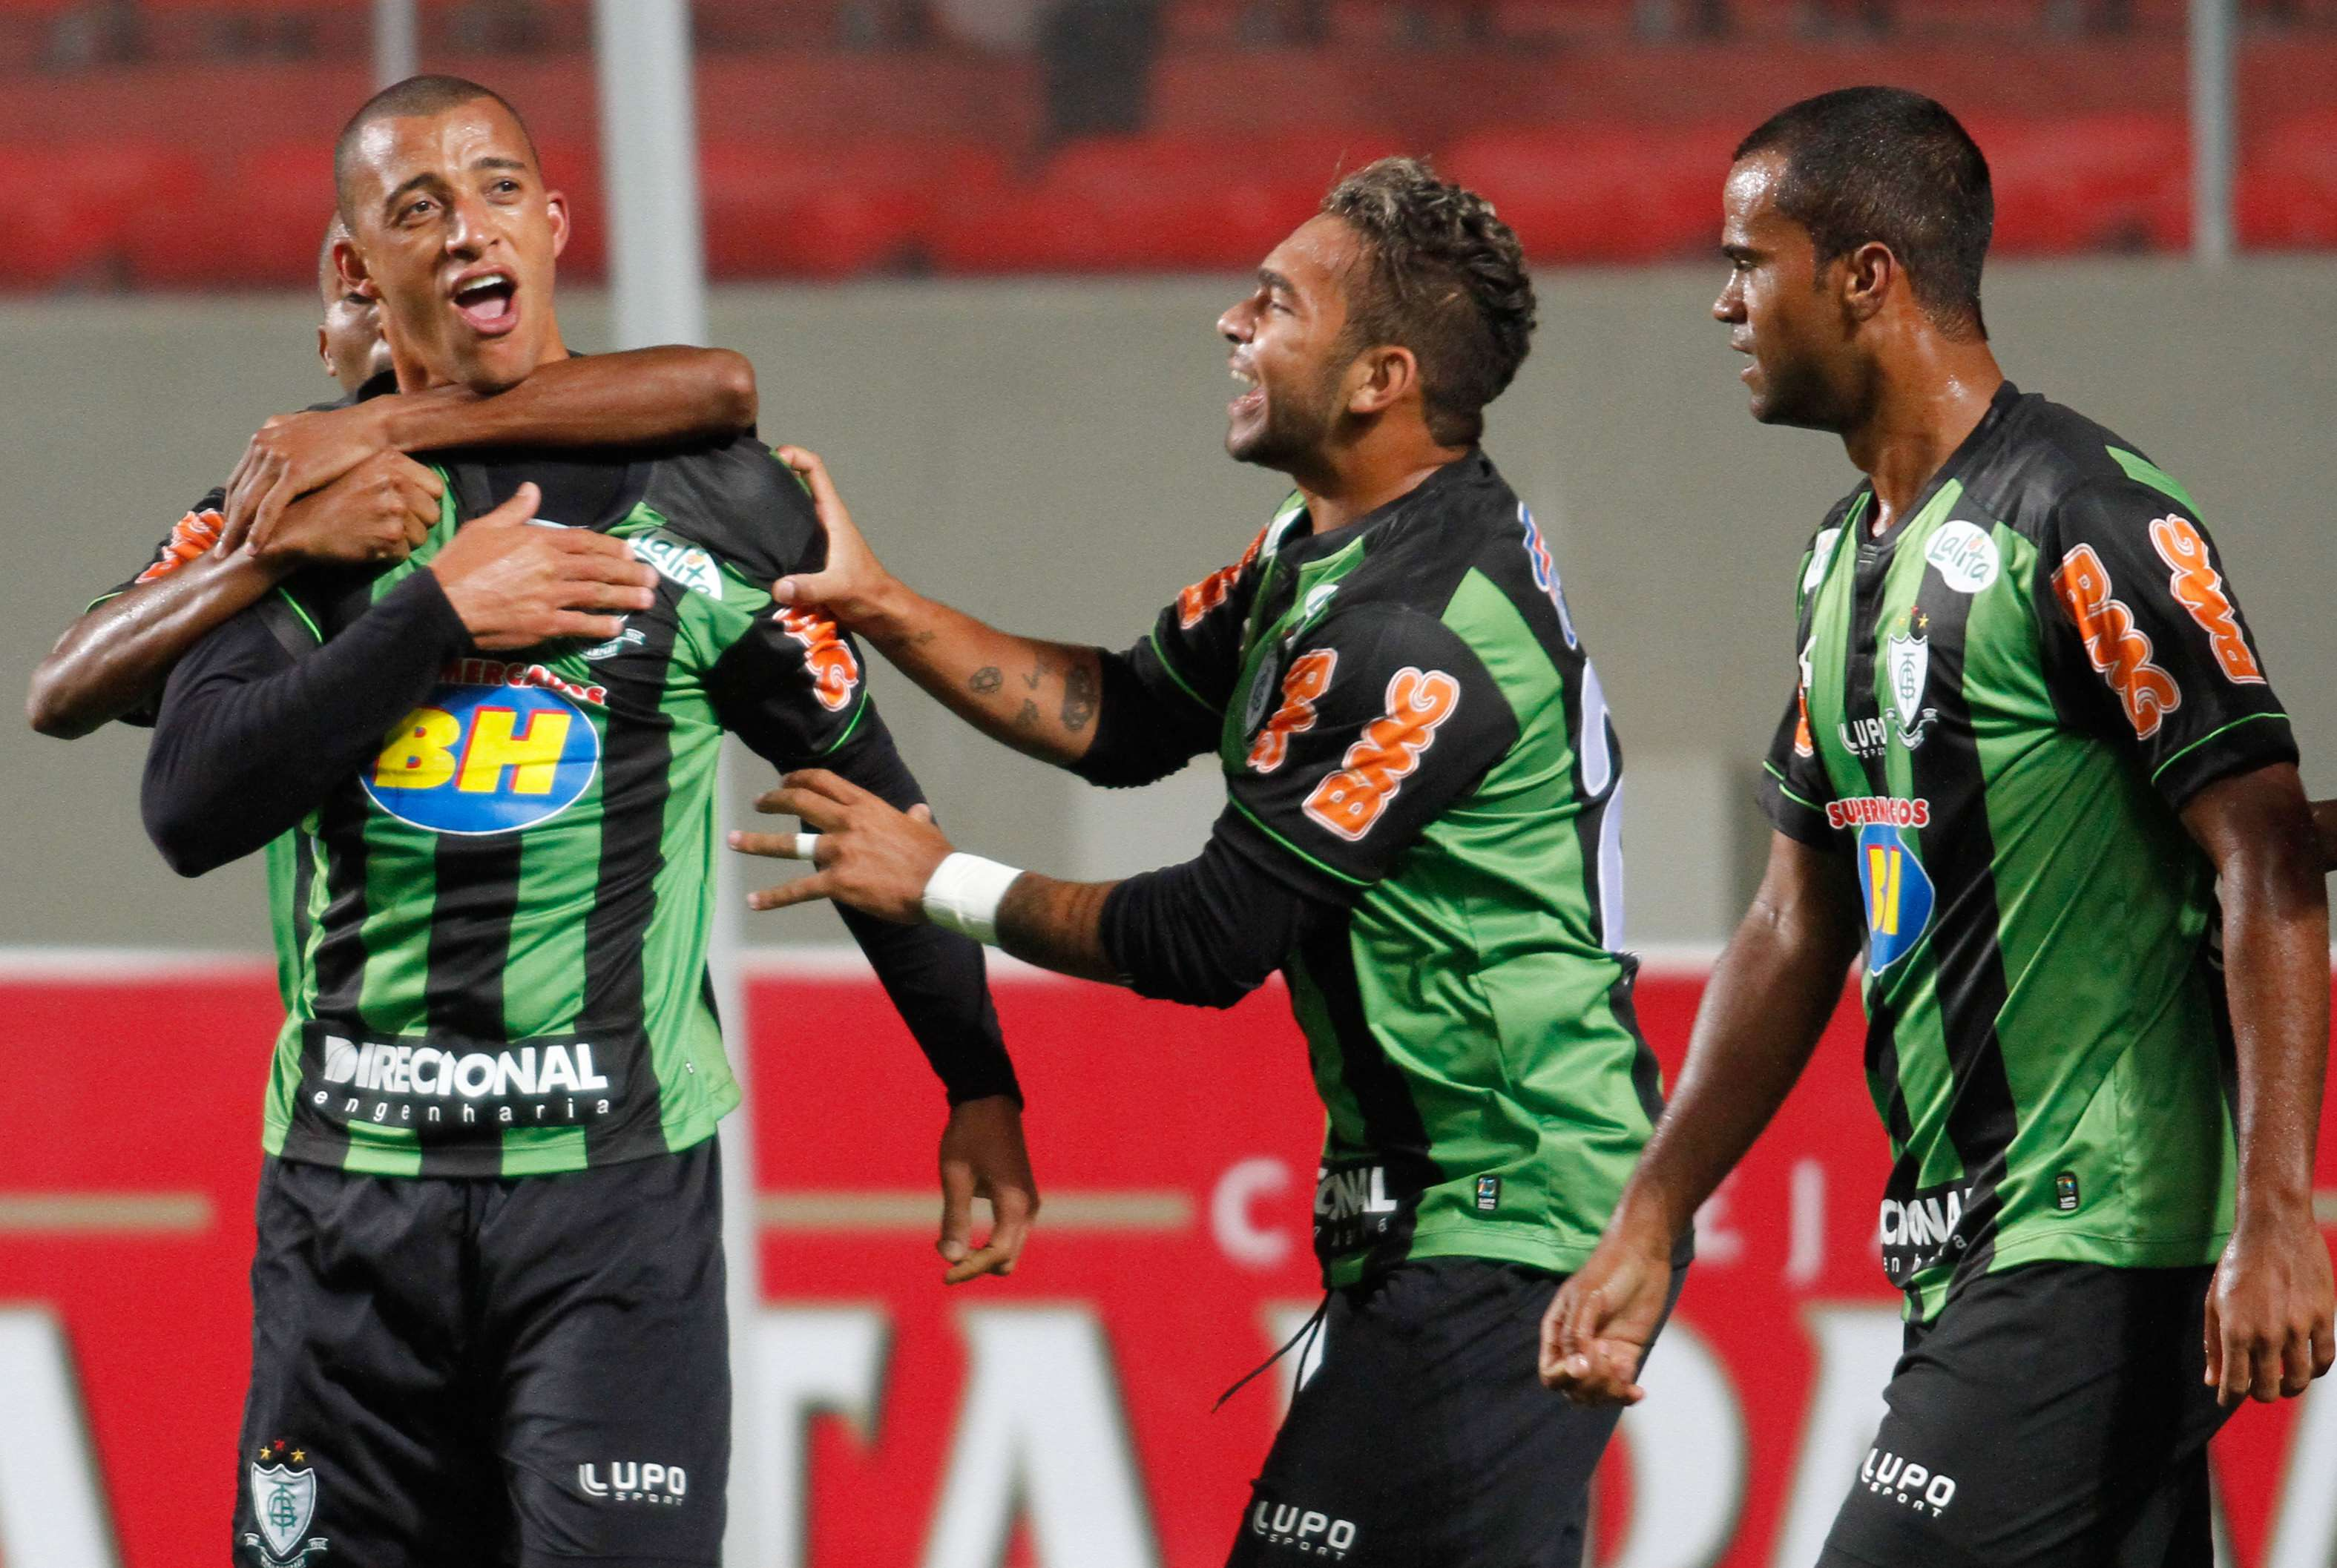 Vitor Hugo comemora o gol marcado no final da partida Foto: Ramon Bittencout/Agência Lance